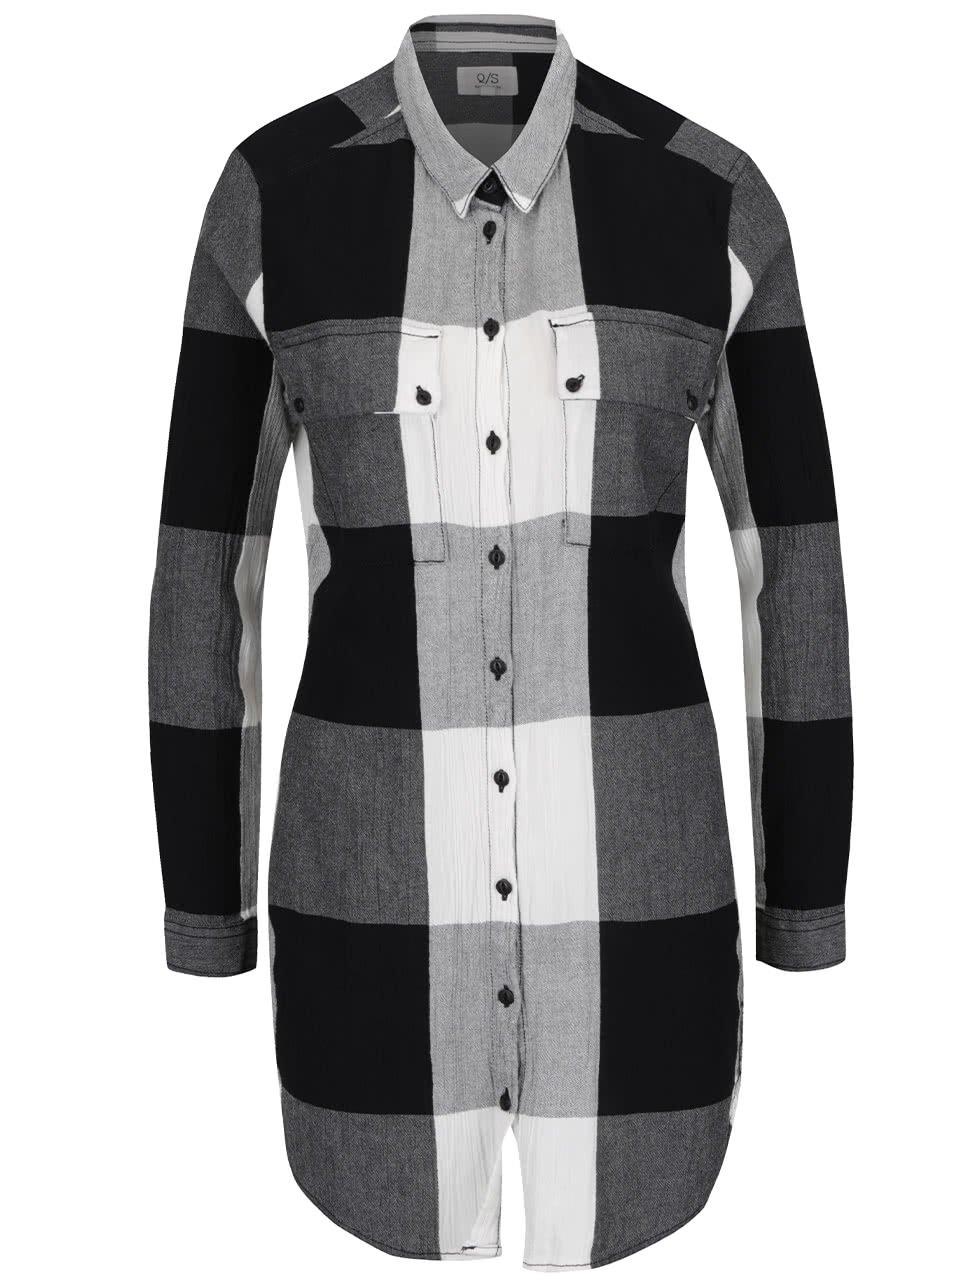 Krémovo-šedá dlouhá dámská kostkovaná košile s.Oliver